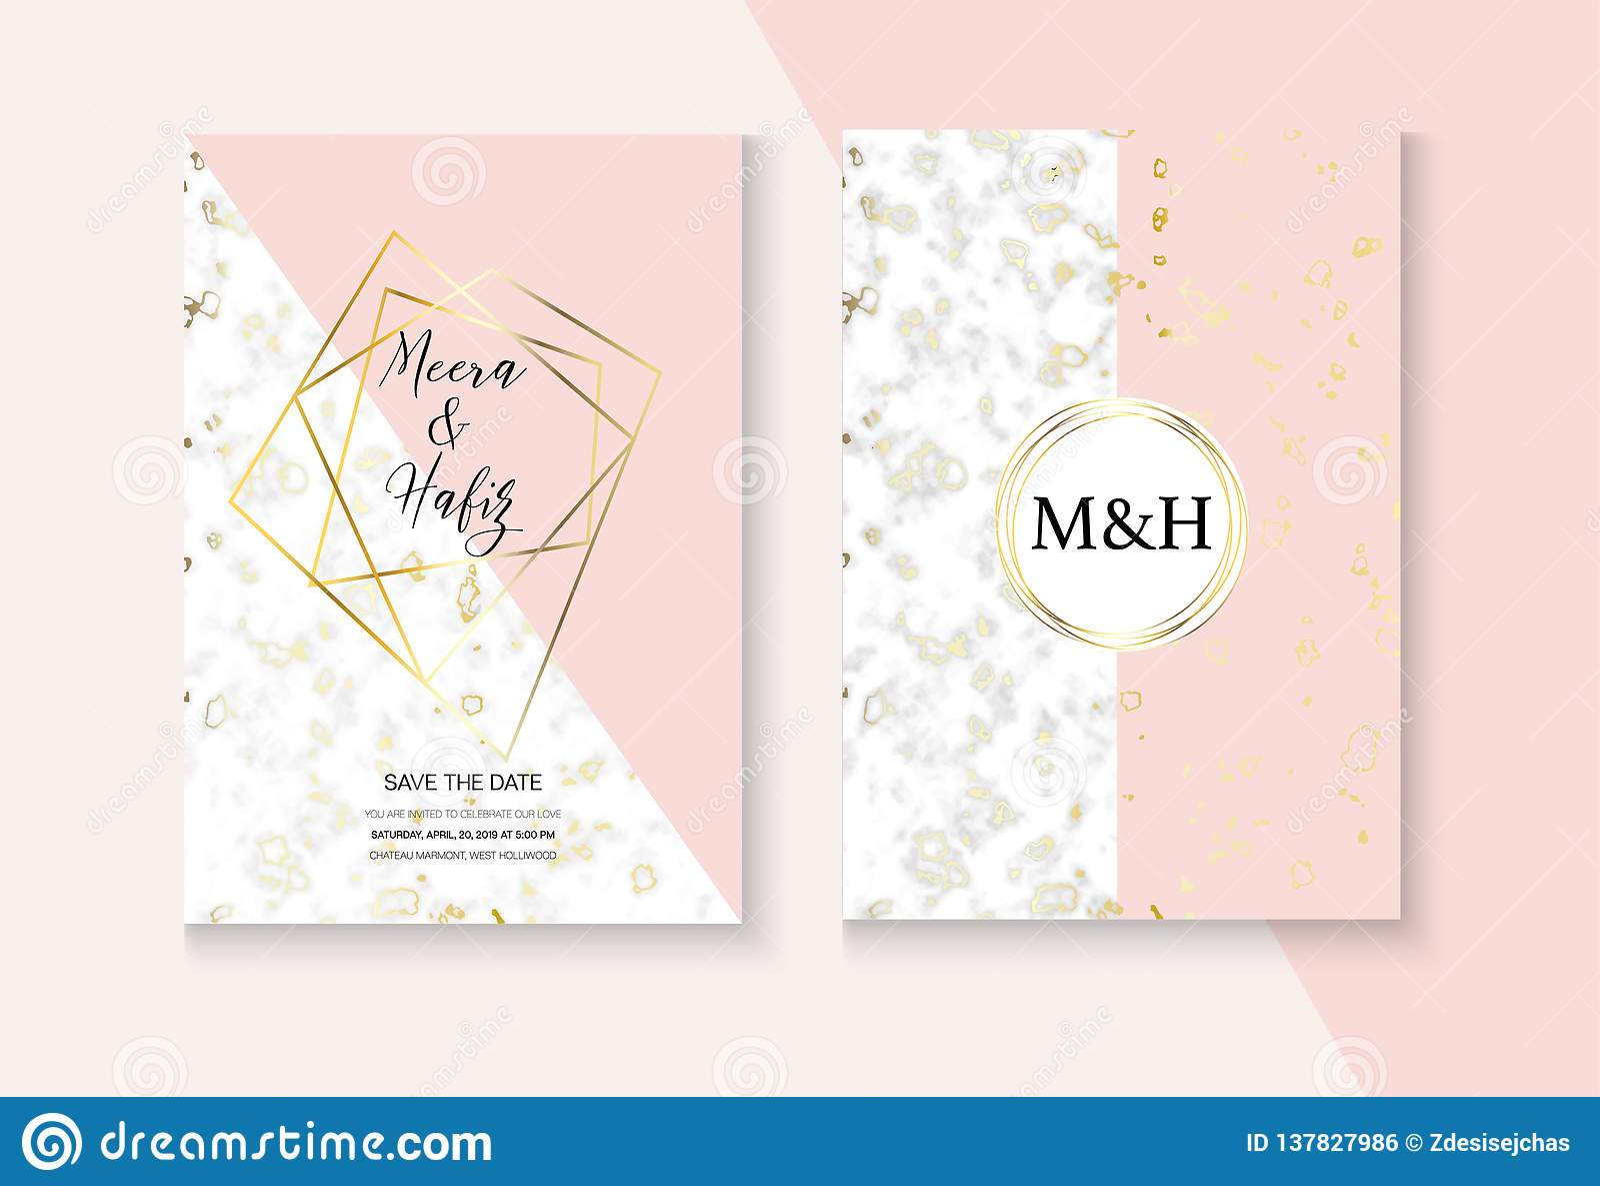 Elegant Marble Wedding Invitation Vector Set Pink Grey